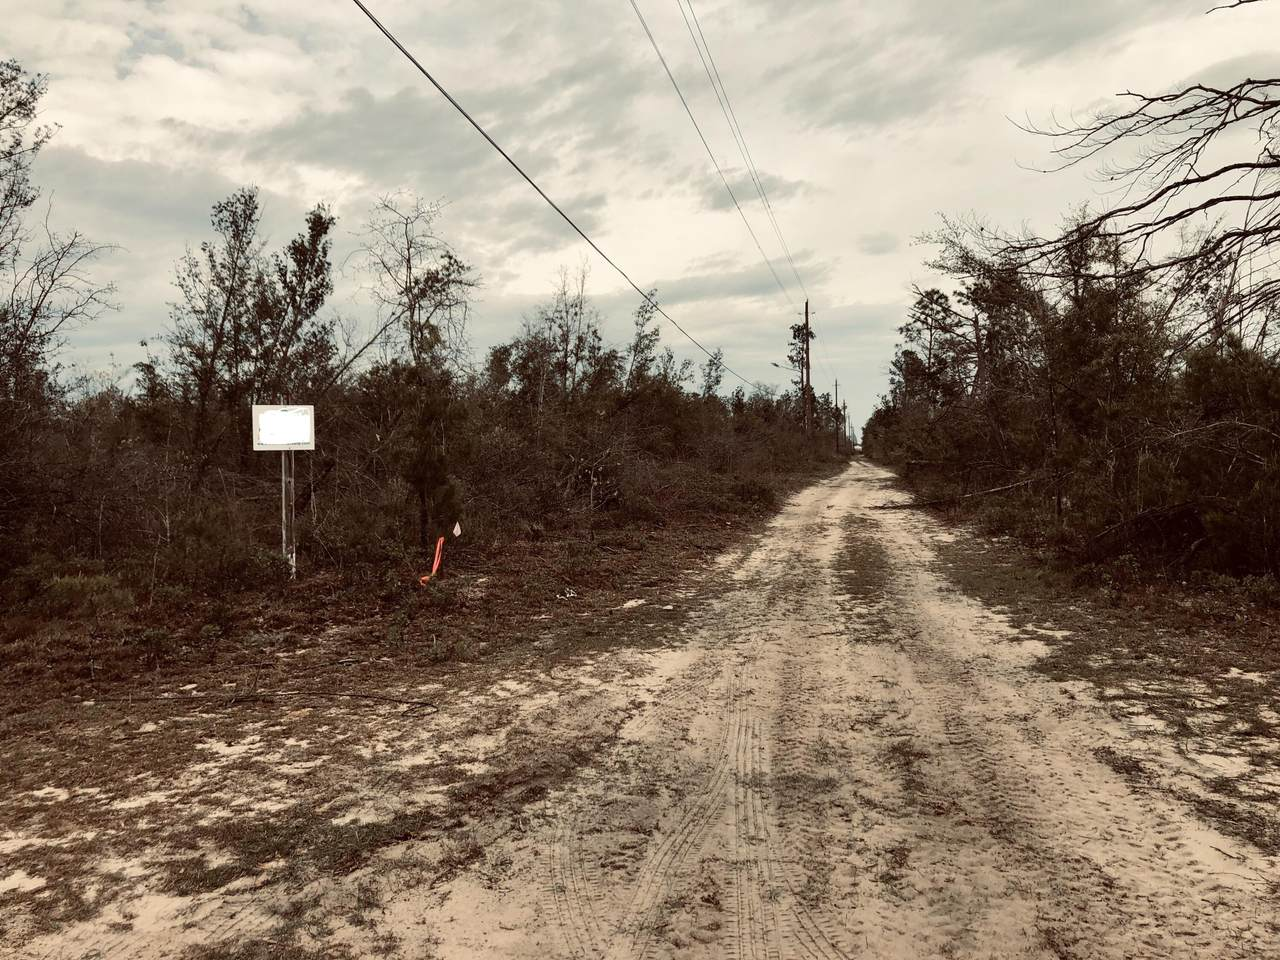 786 Highway 20 - Photo 1